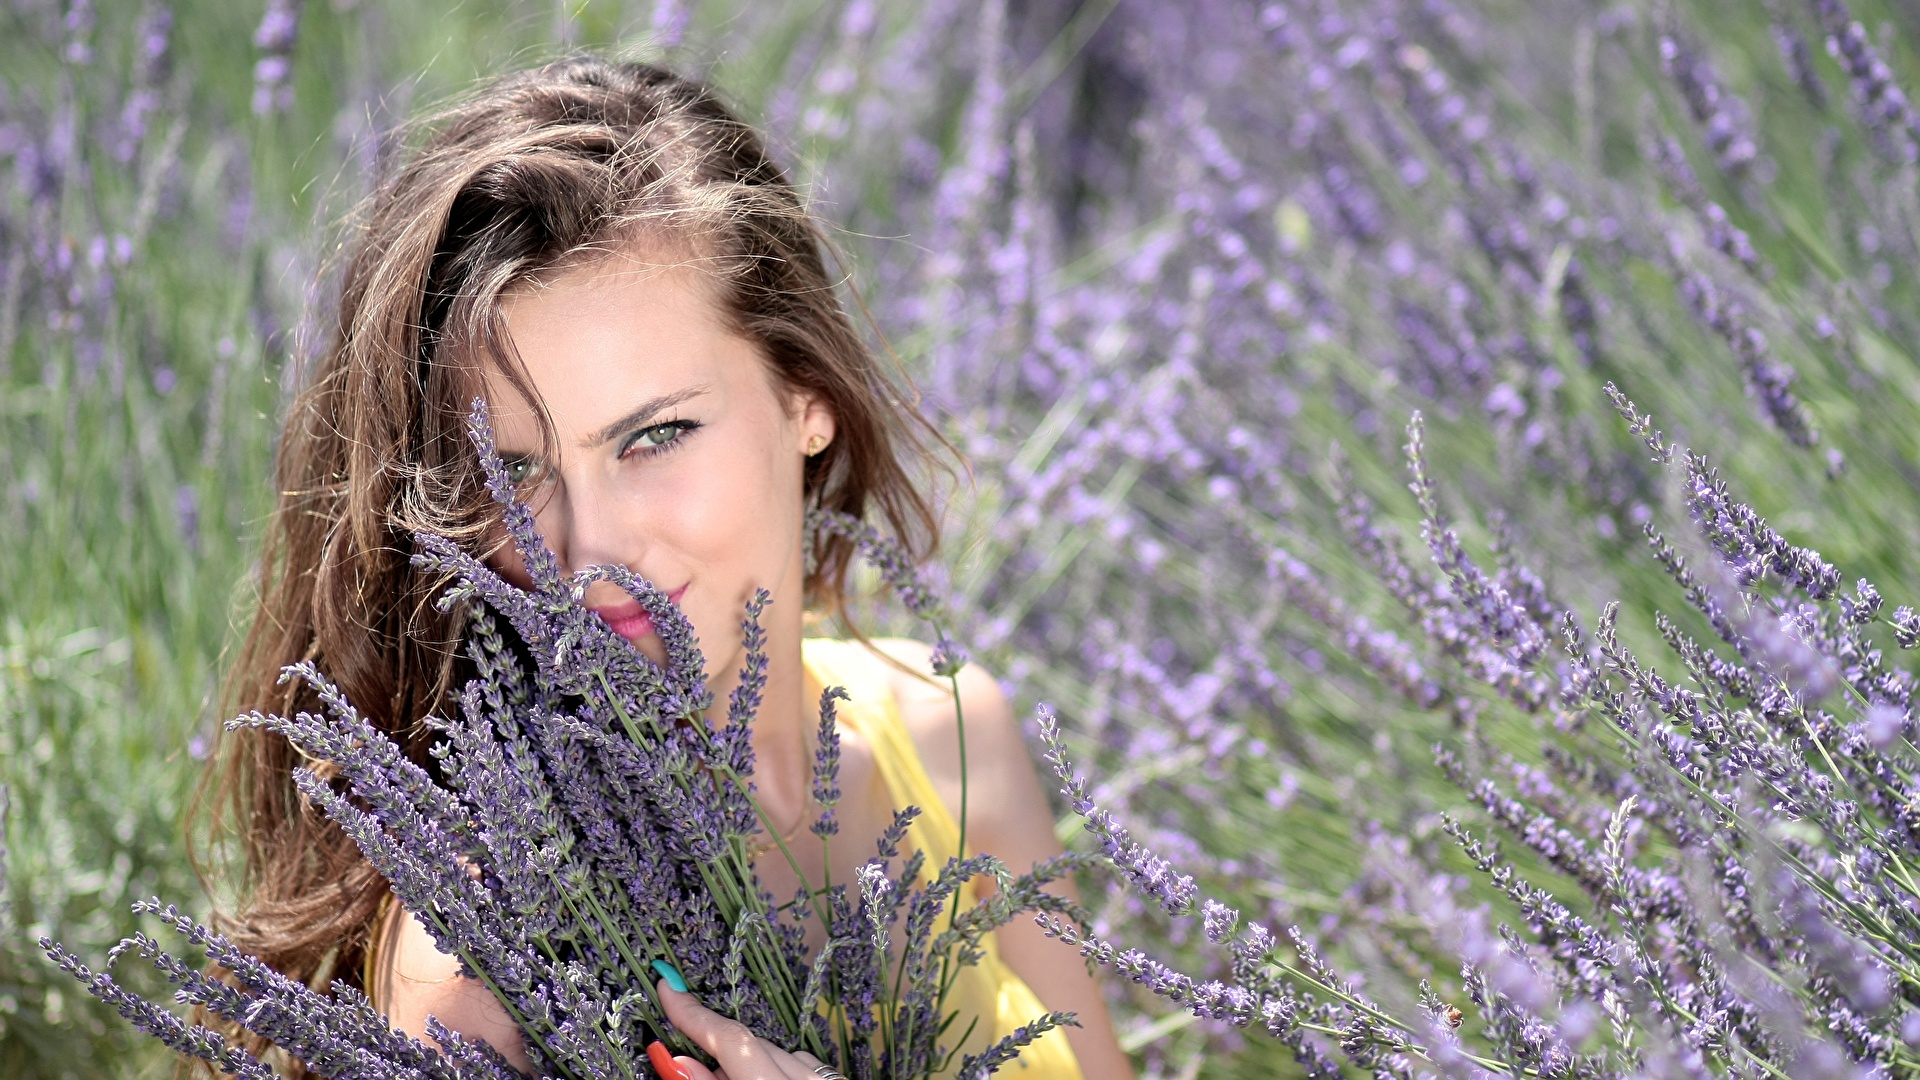 Фото Шатенка Маникюр Улыбка Красивые Девушки Лаванда Взгляд 1920x1080 смотрит